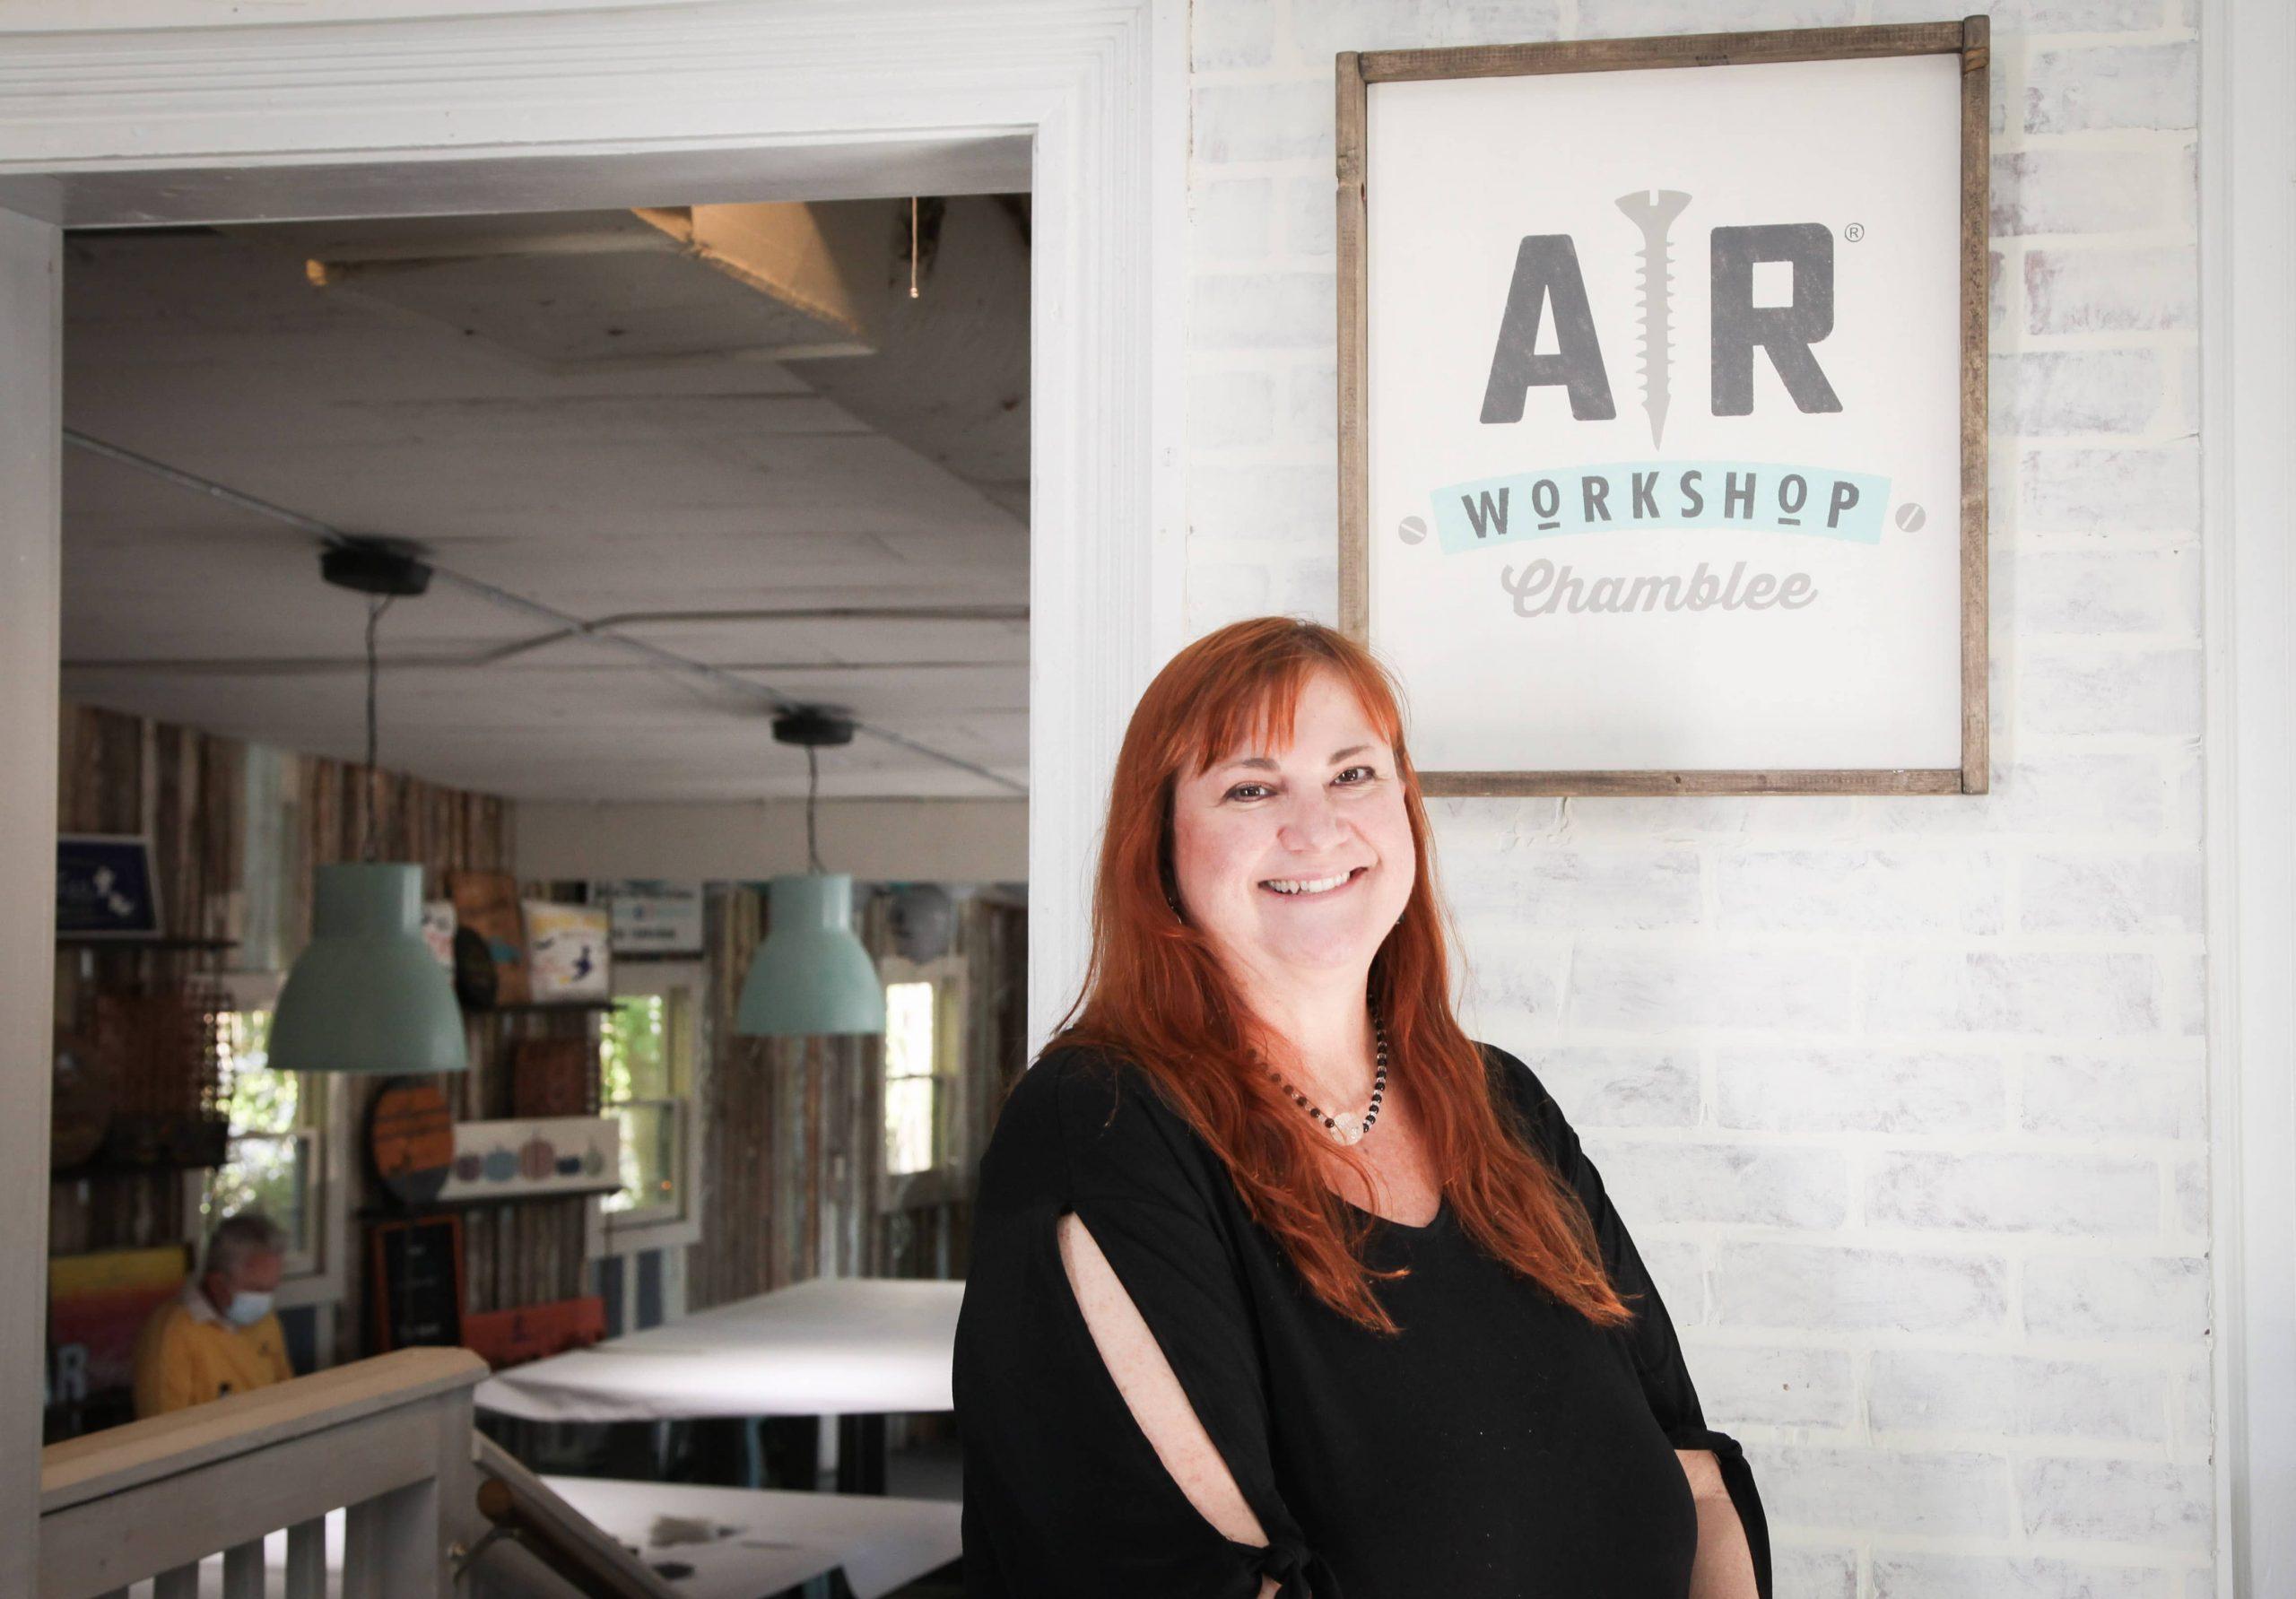 AR Workshop Chamblee